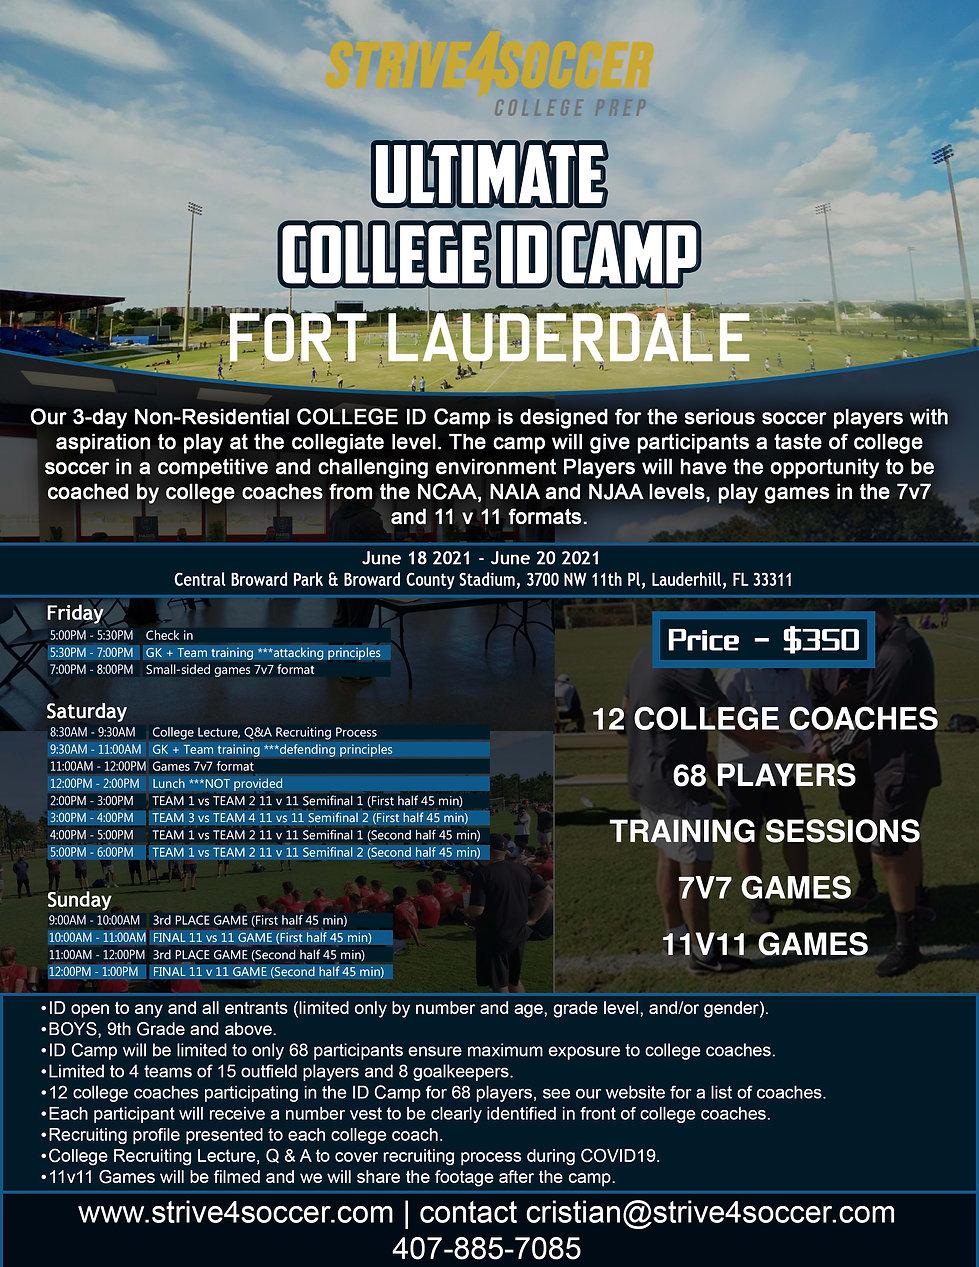 June 18-20 college id camp.jpg